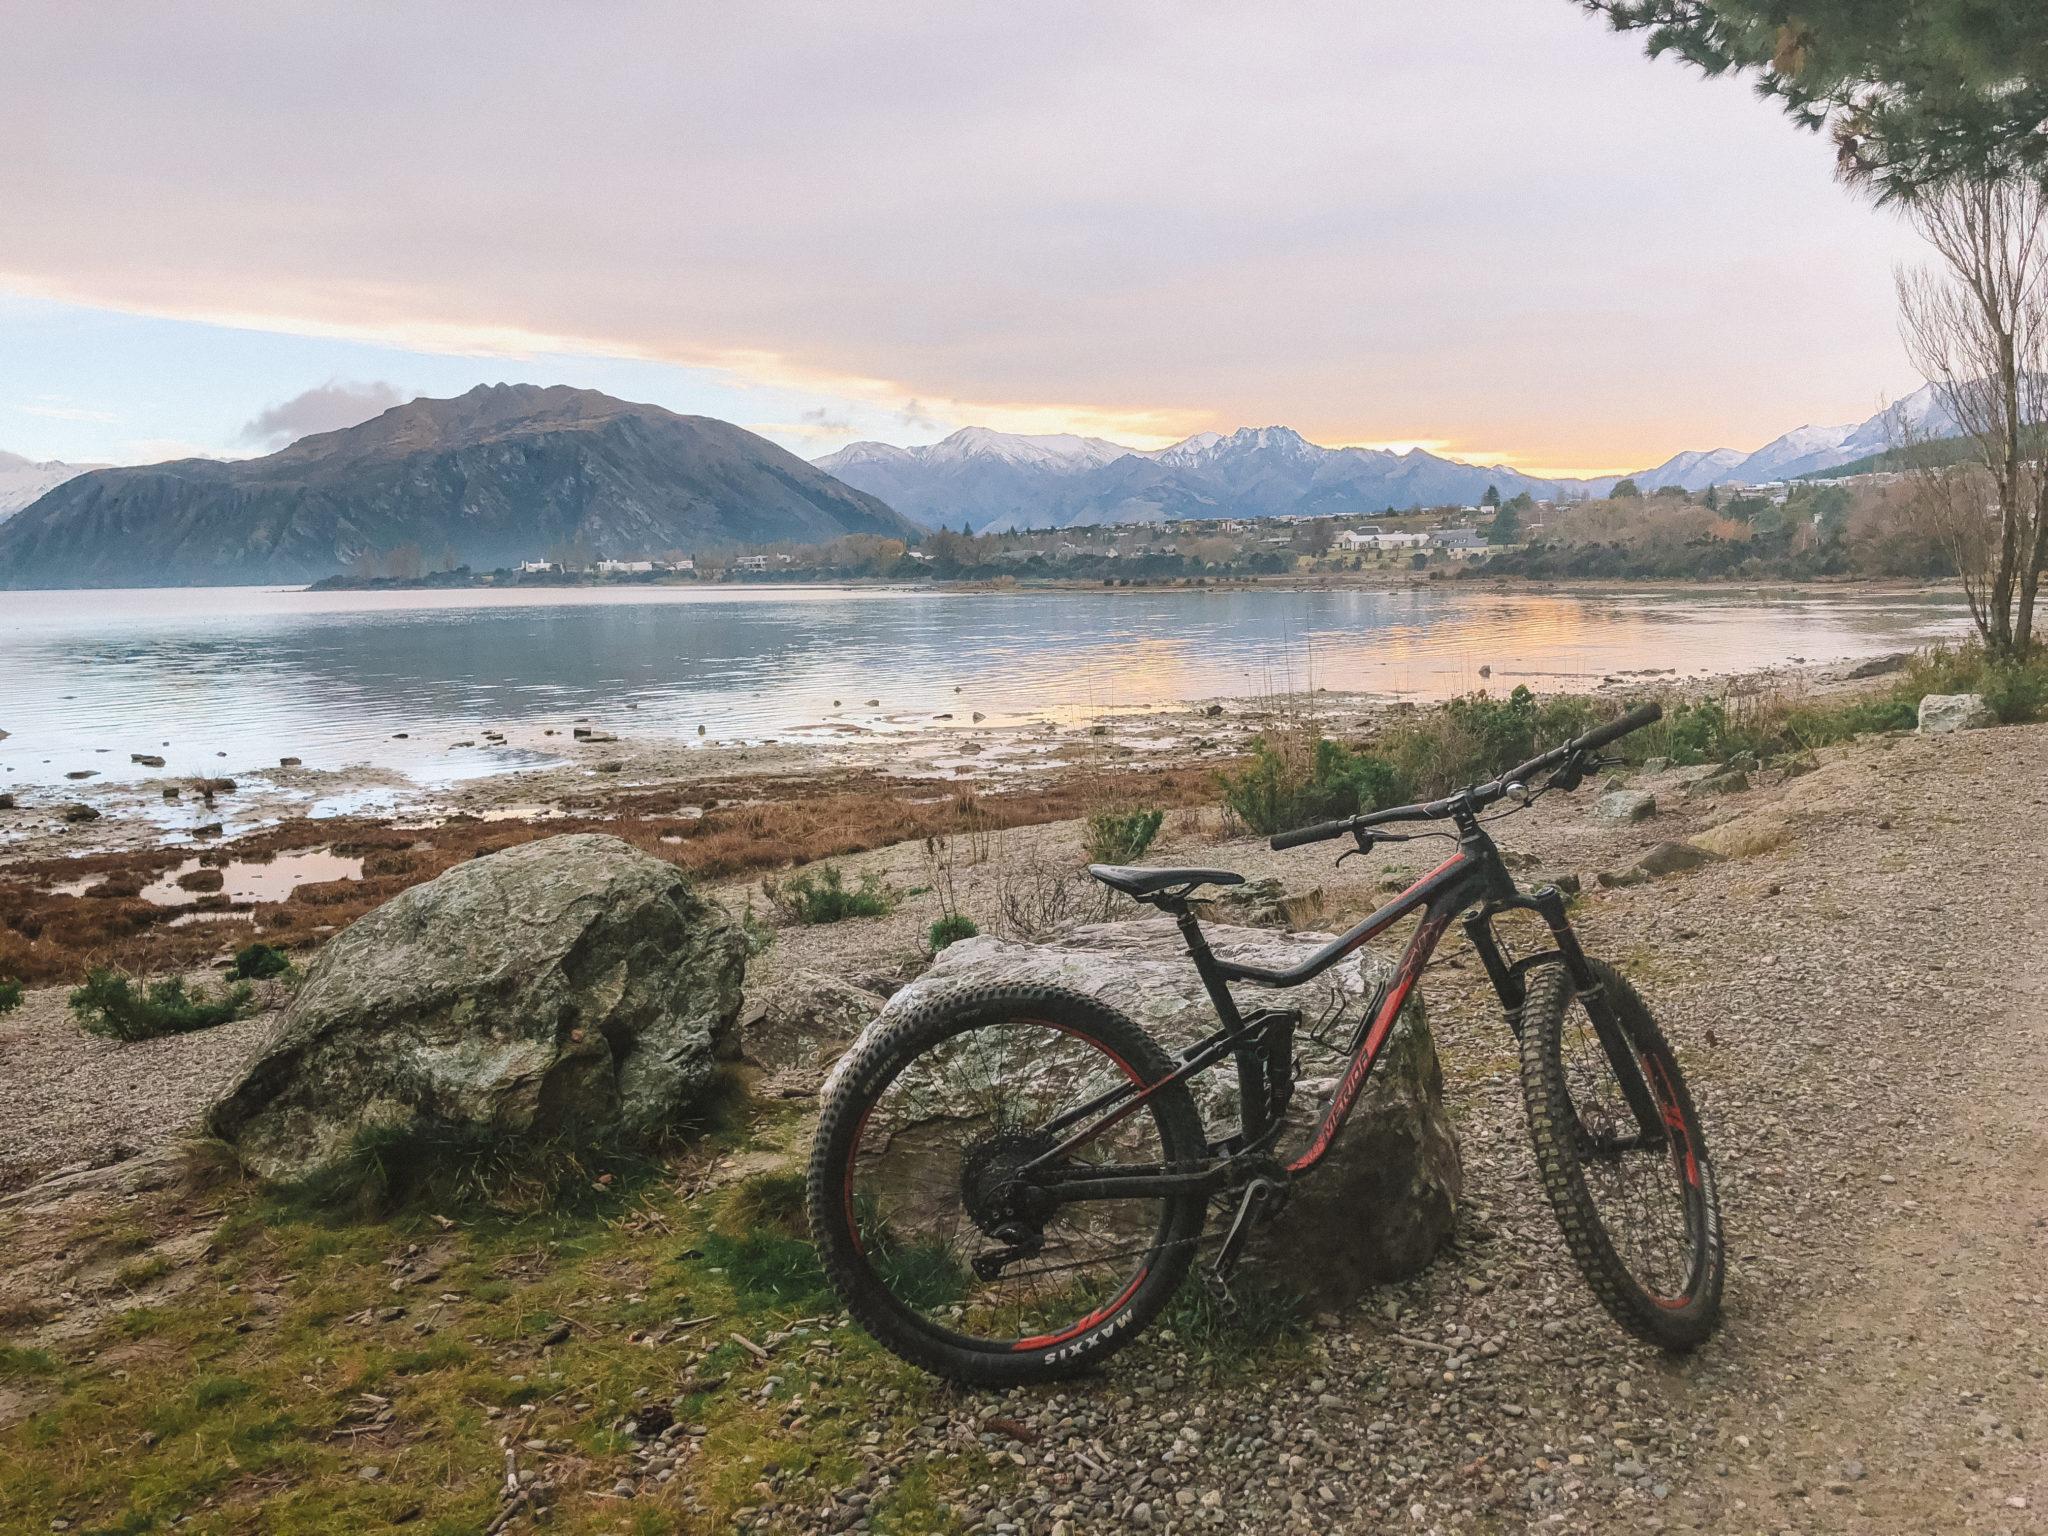 Best Things to Do in Wanaka New Zealand | WORLD OF WANDERLUST